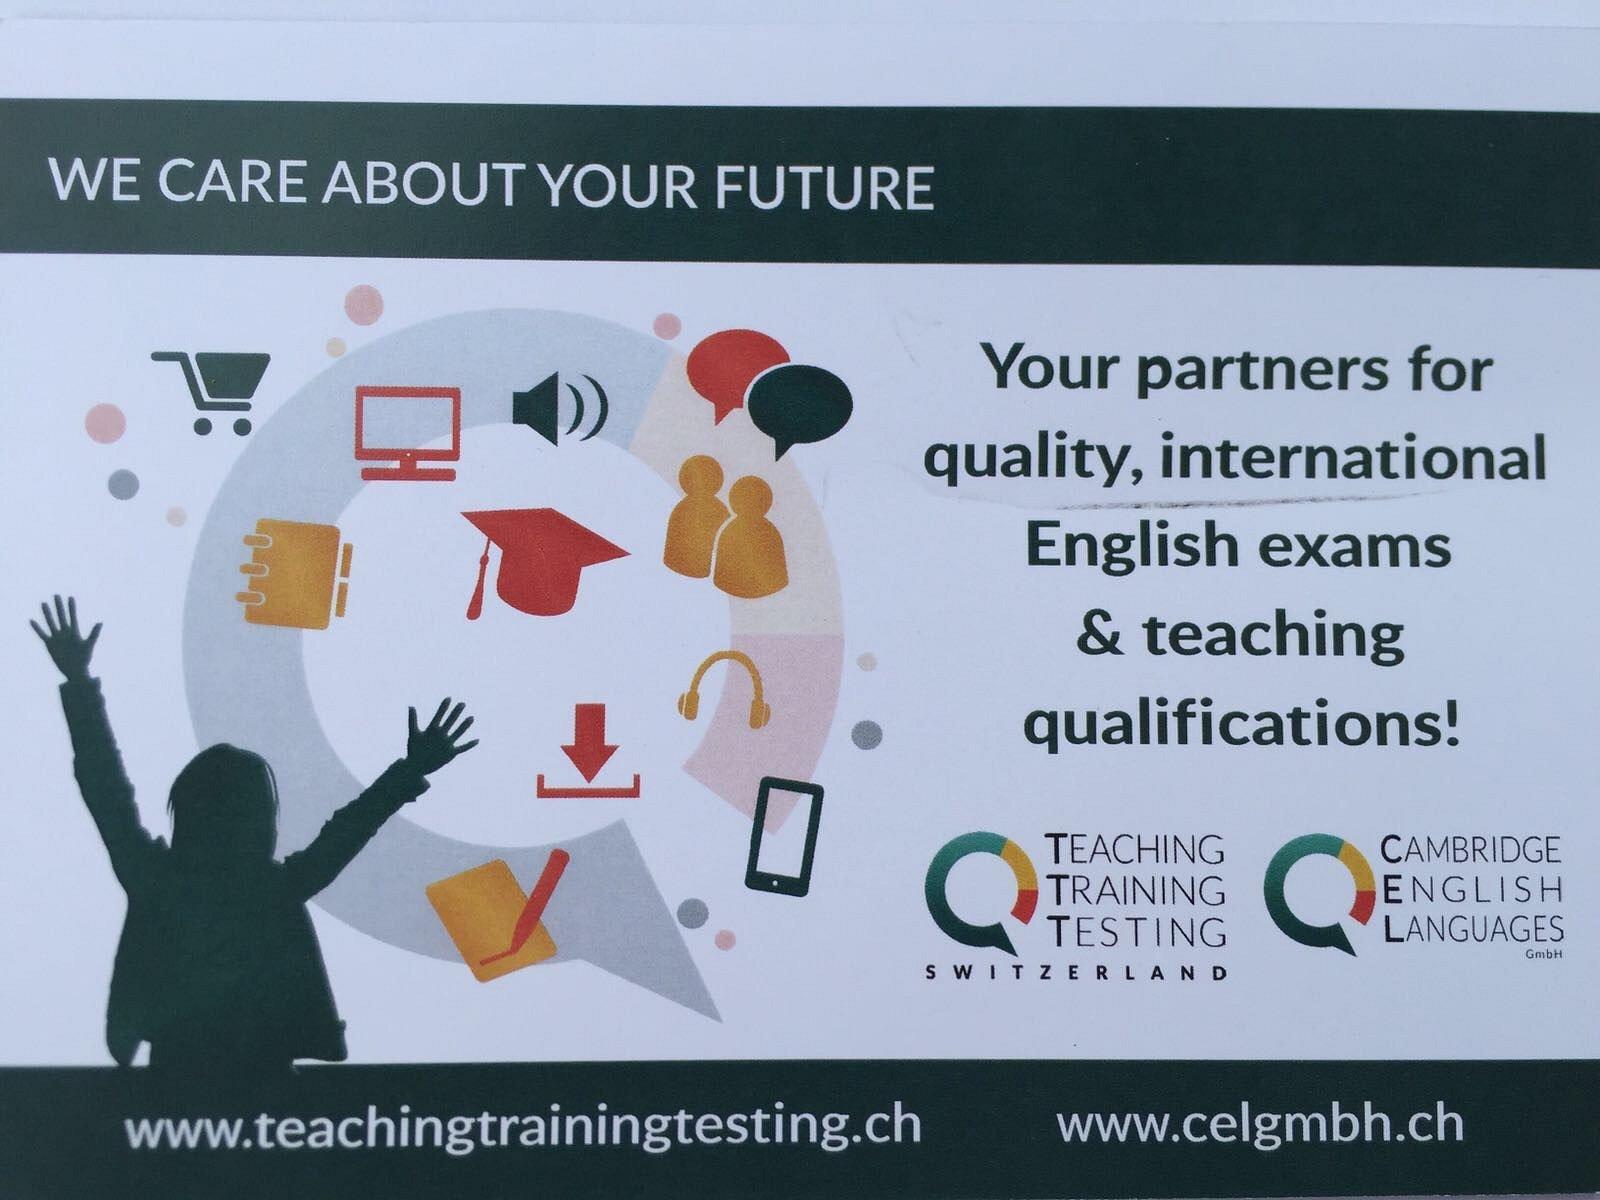 Cambridge English Languages GmbH